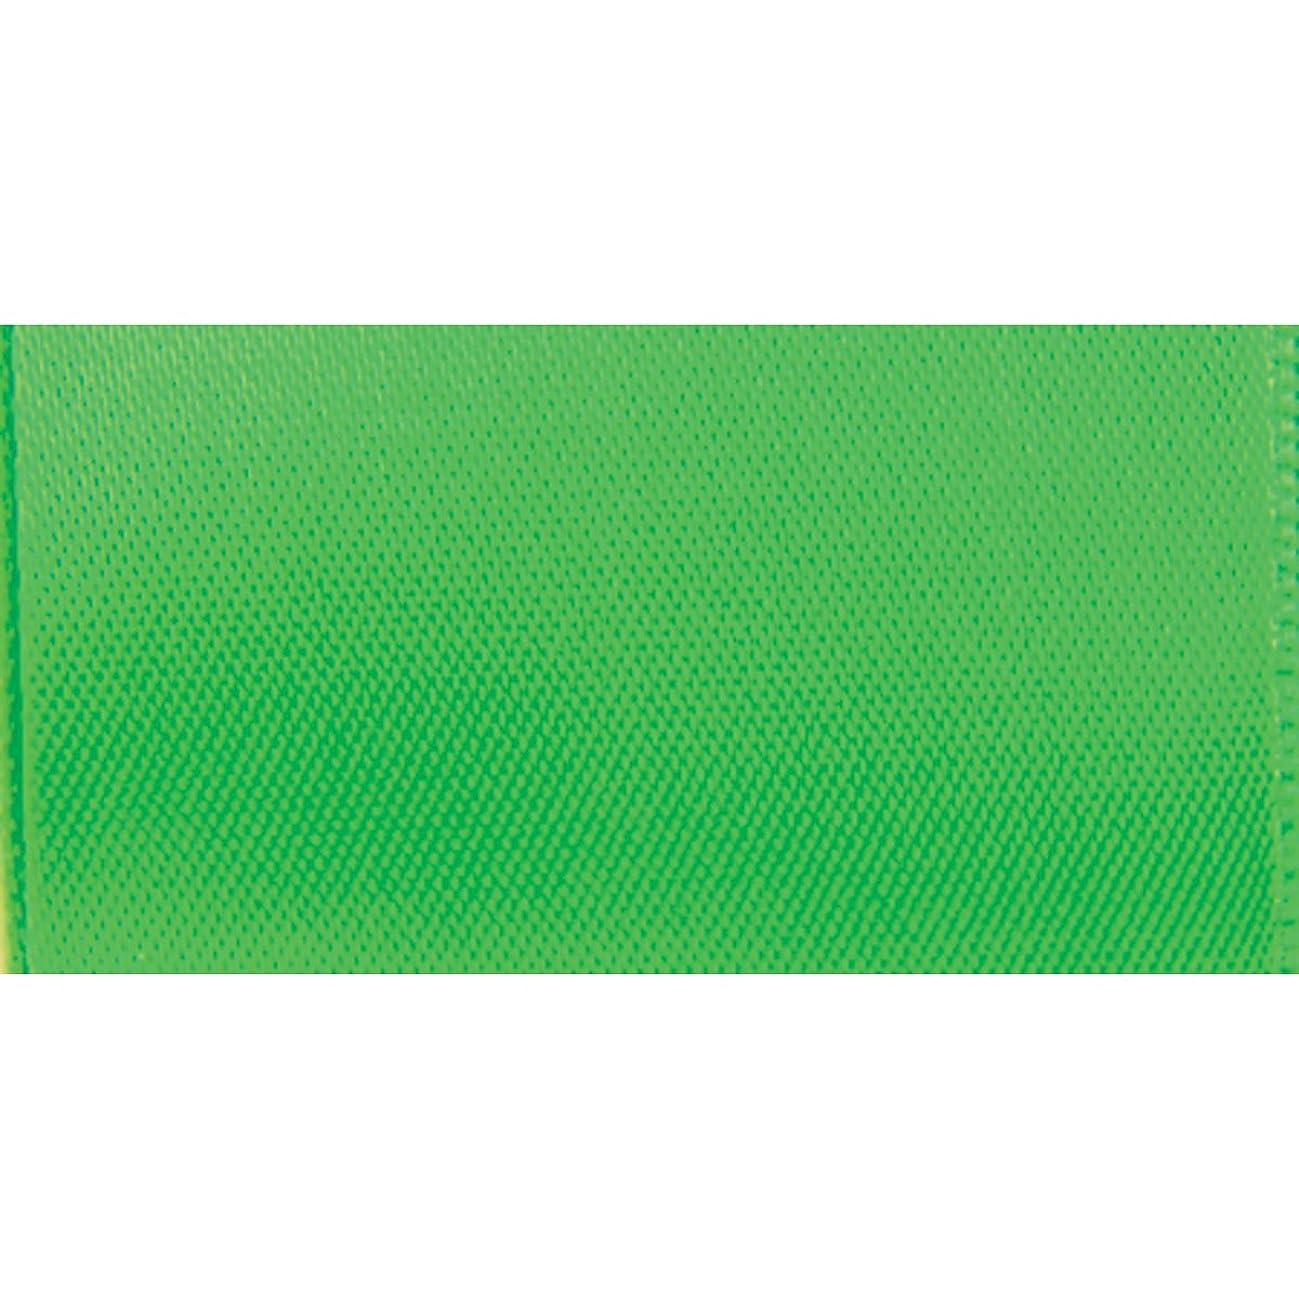 Wrights 117-794-922 Single Fold Satin Blanket Binding, Leaf Green, 4.75-Yard